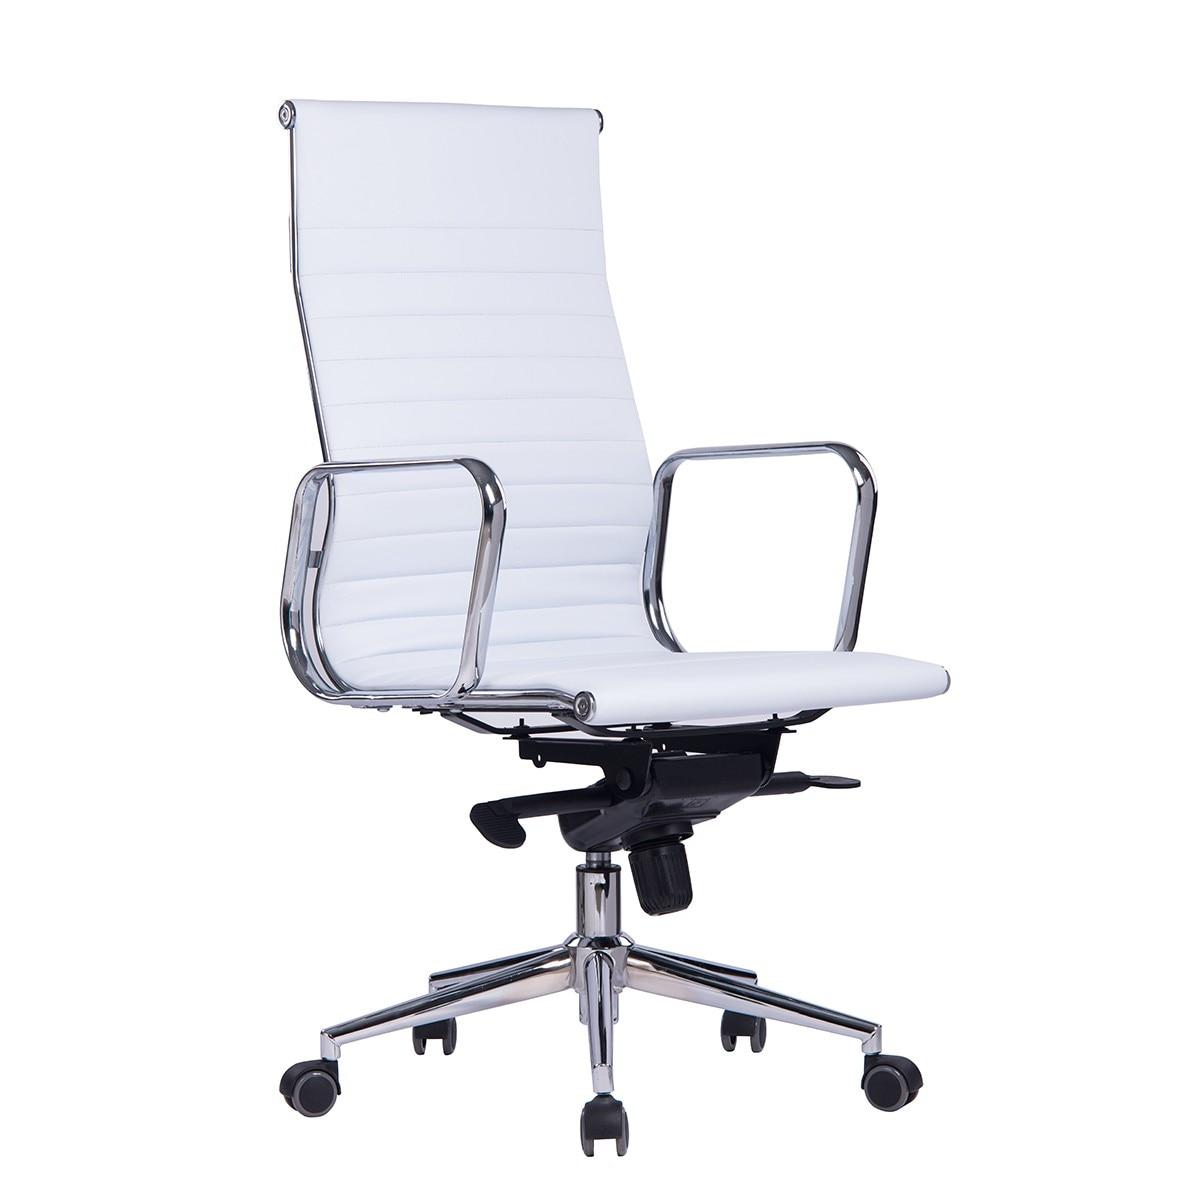 Office Armchair ARKANSAS, High, Similpiel White